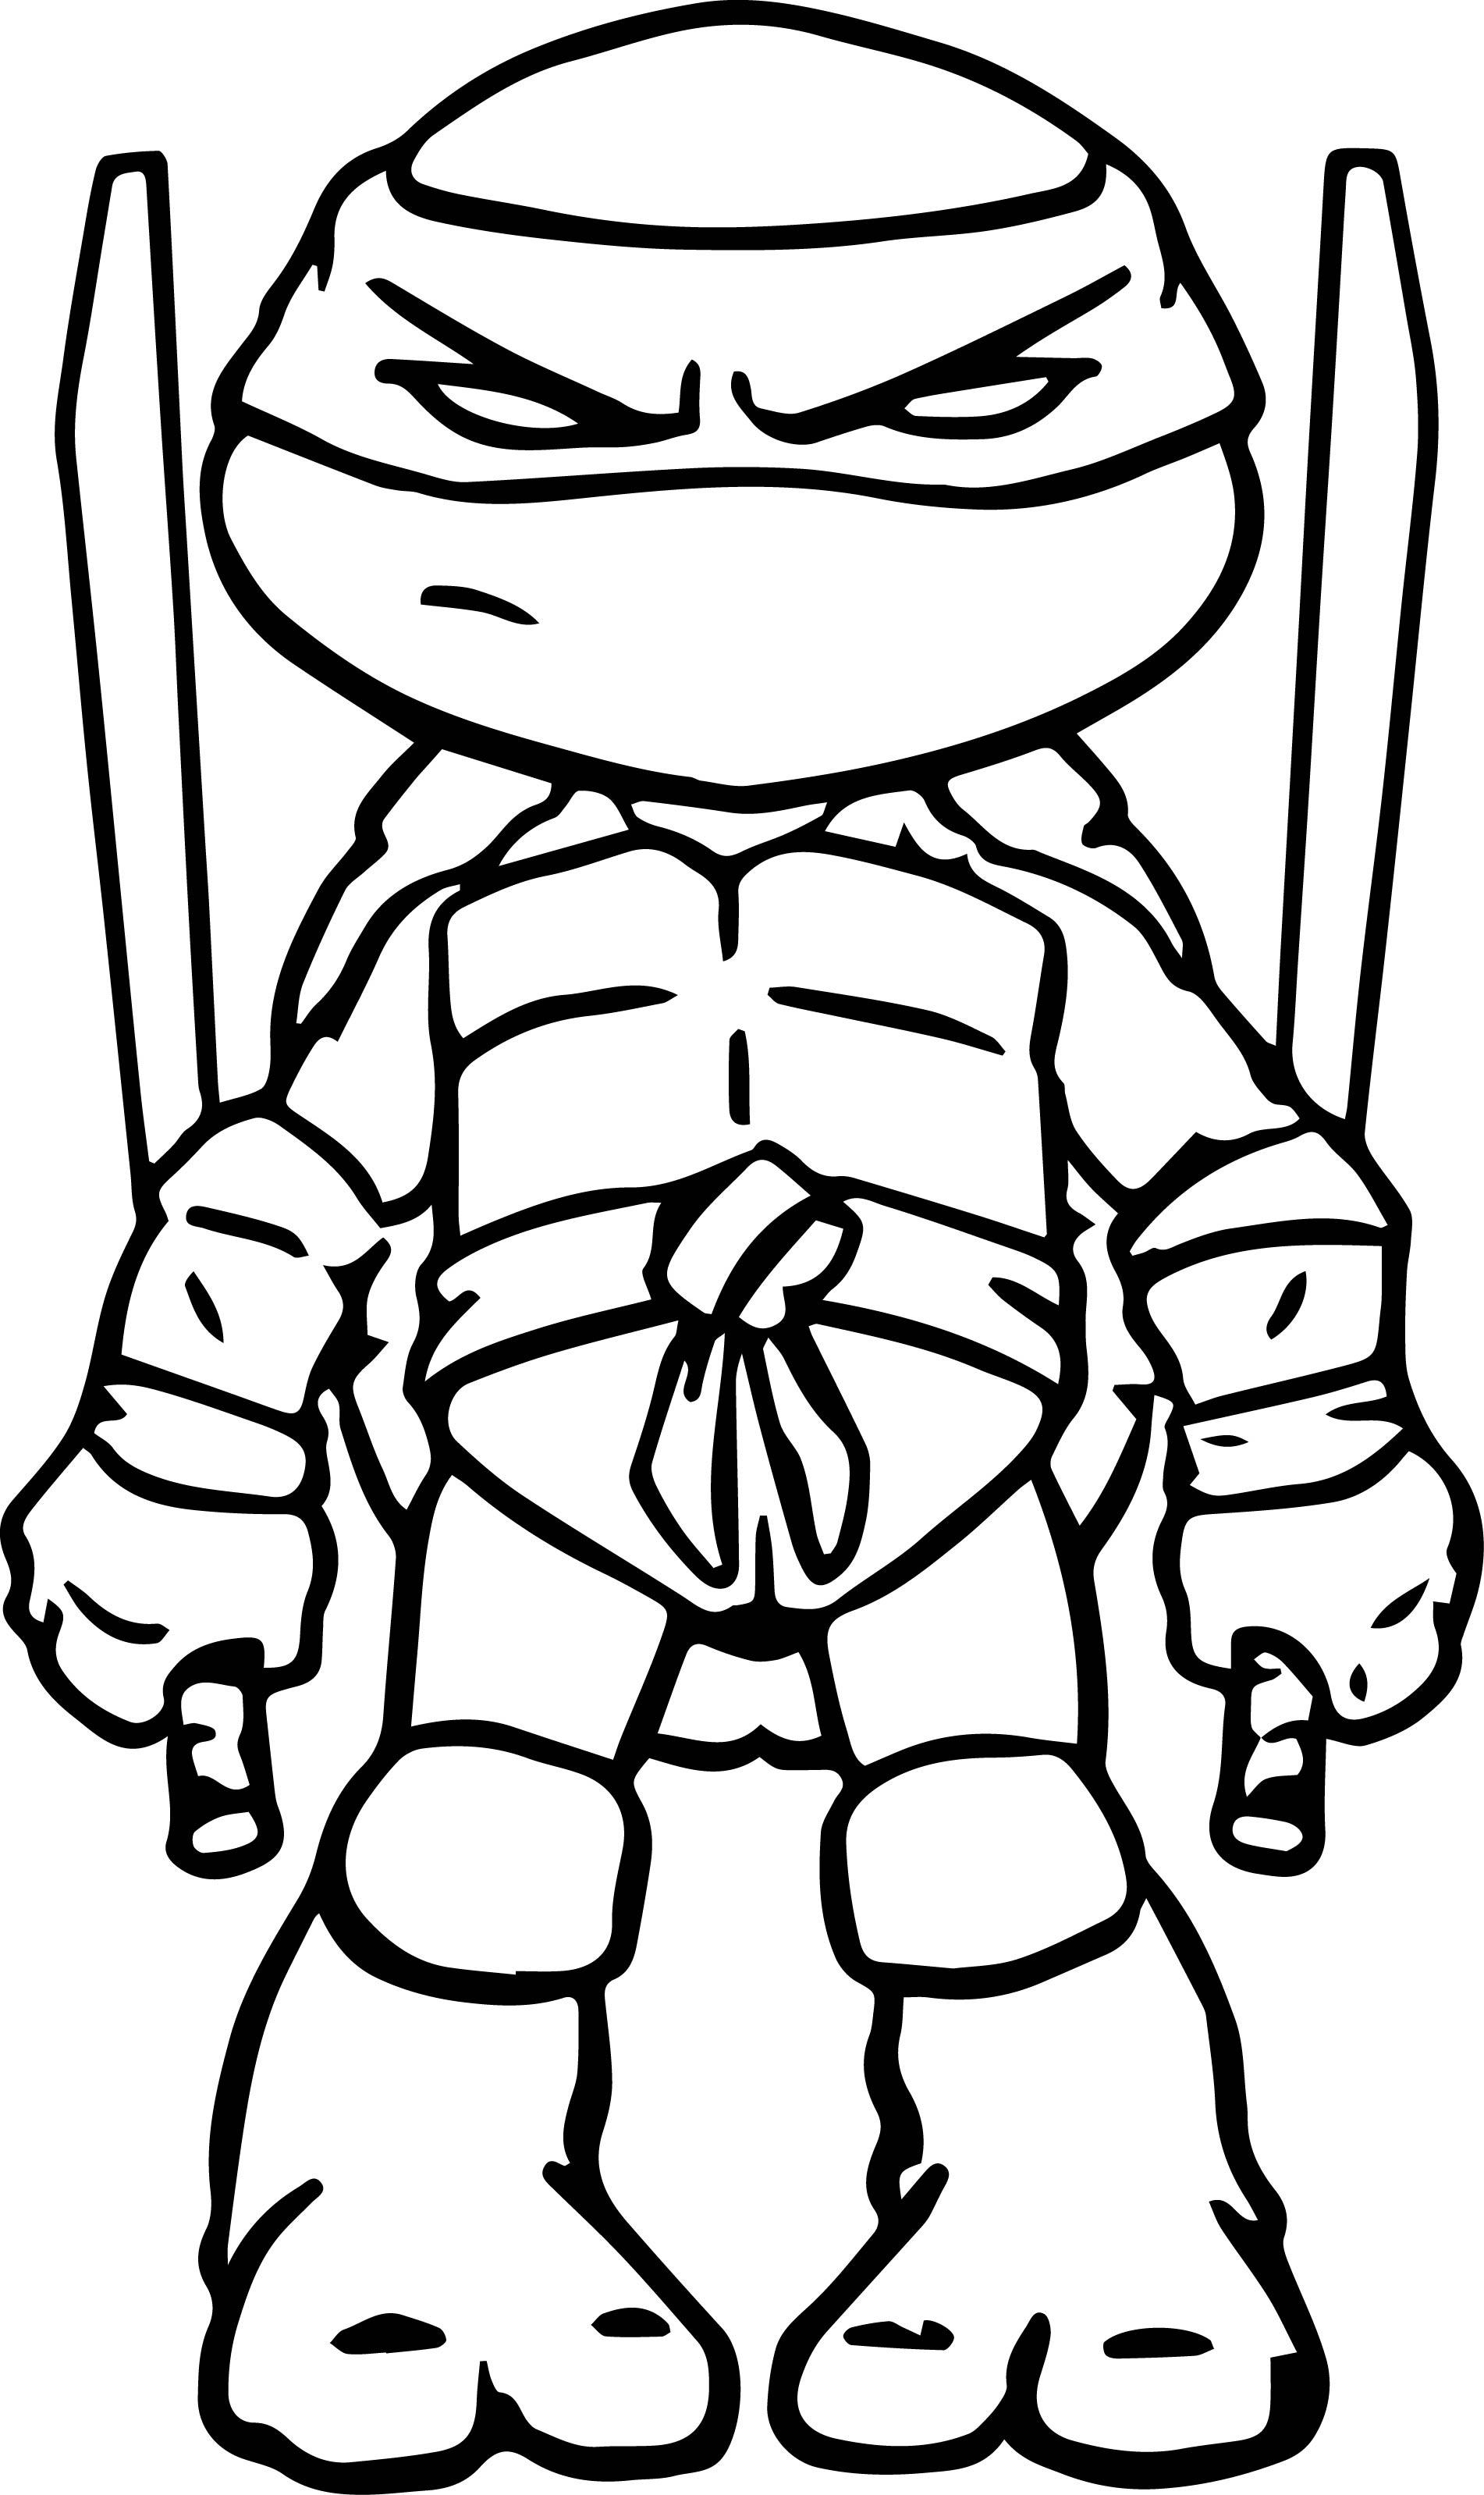 Chibi Turtle Drawing At Getdrawings